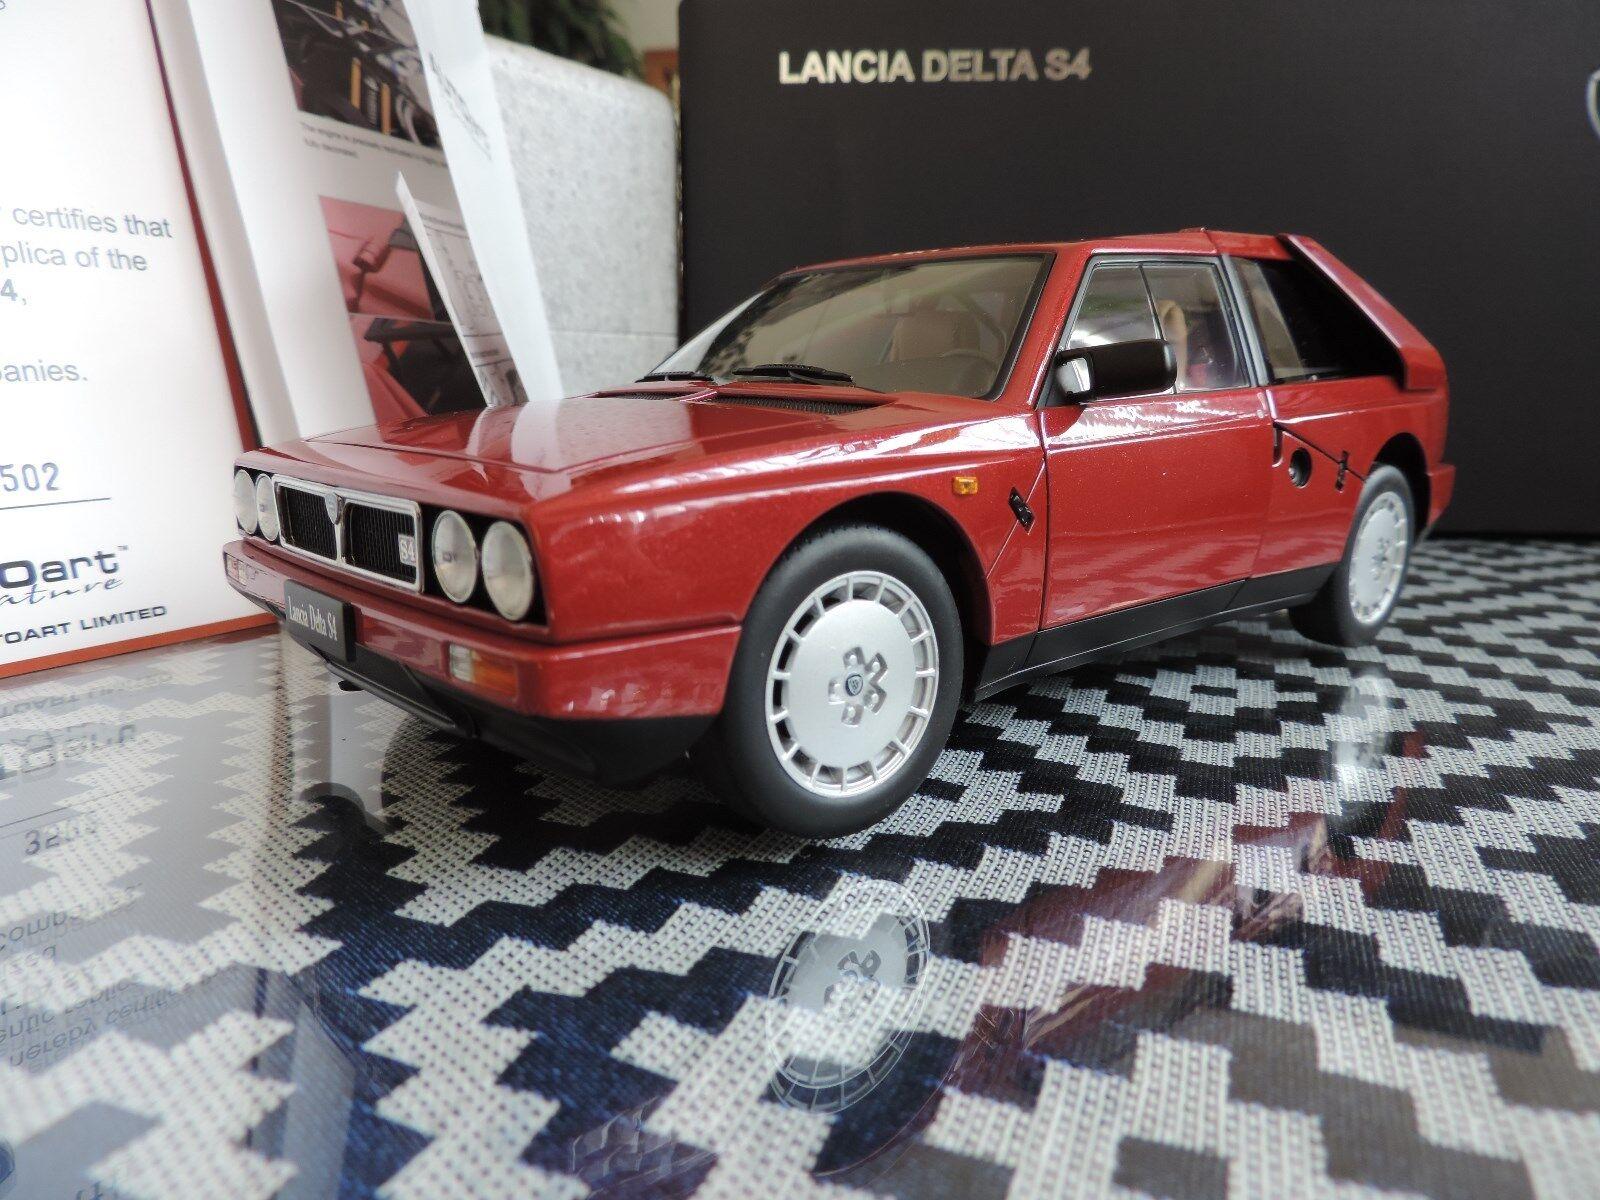 LANCIA DELTA S4 1985 AUTOART SIGNATURE 1 18 rallye rouge